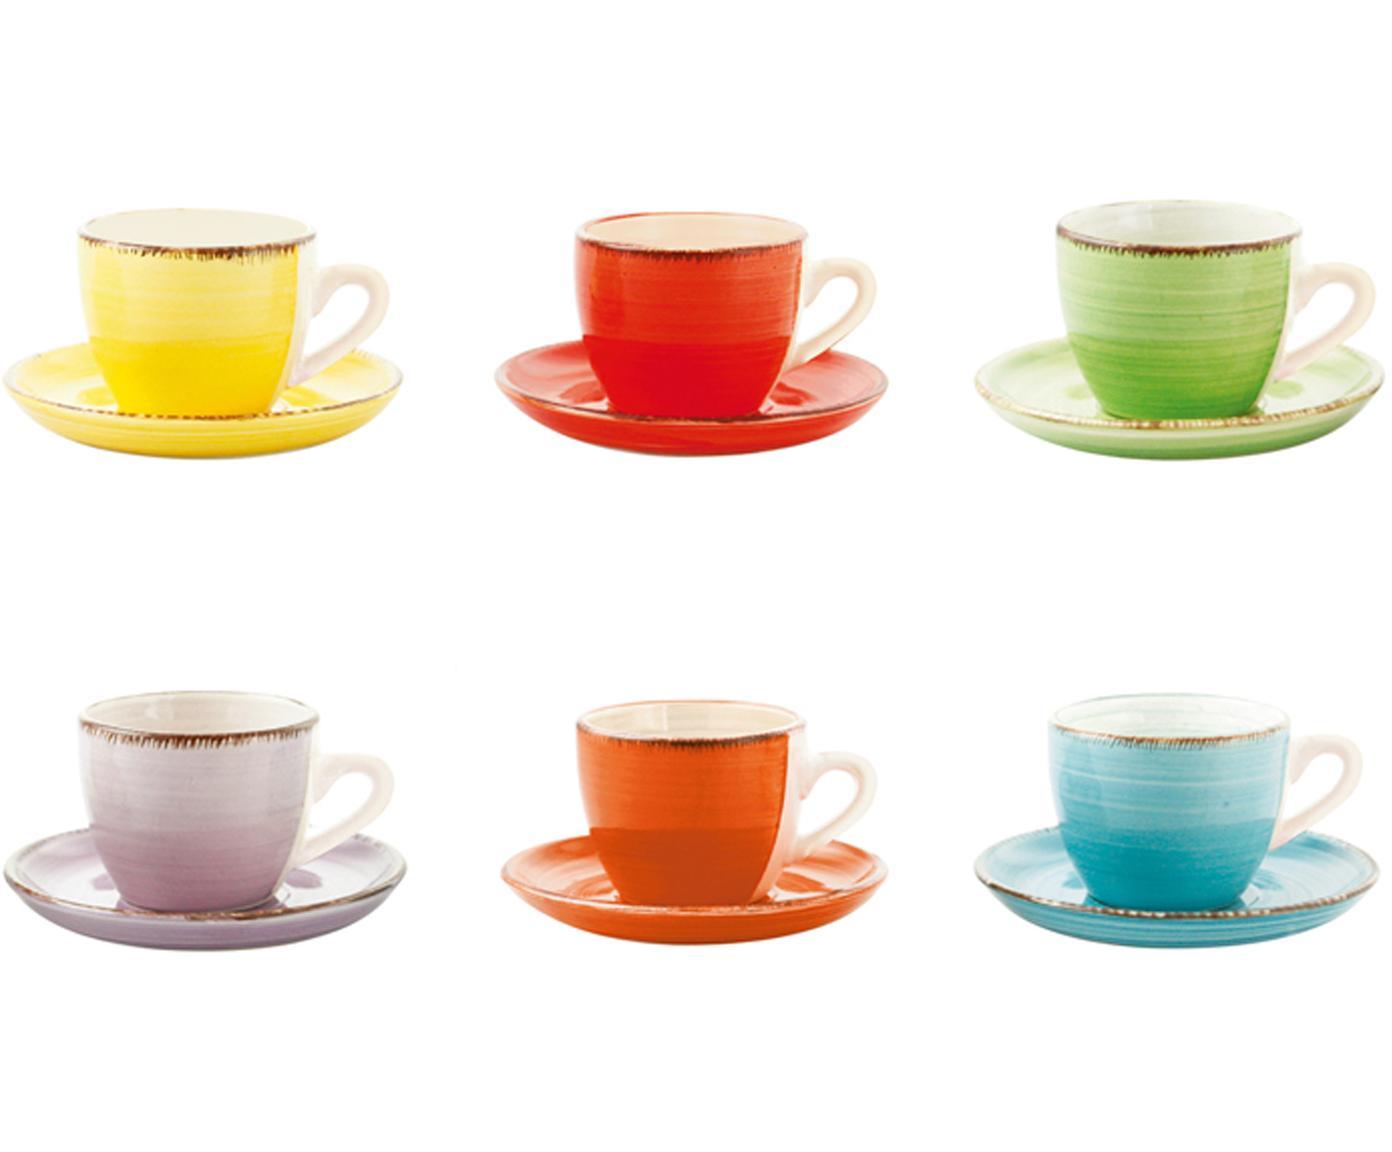 Set de tazas espresso Baita, 12pzas., Gres, Amarillo, rojo, verde claro, lila, naranja, azul claro, 90 ml